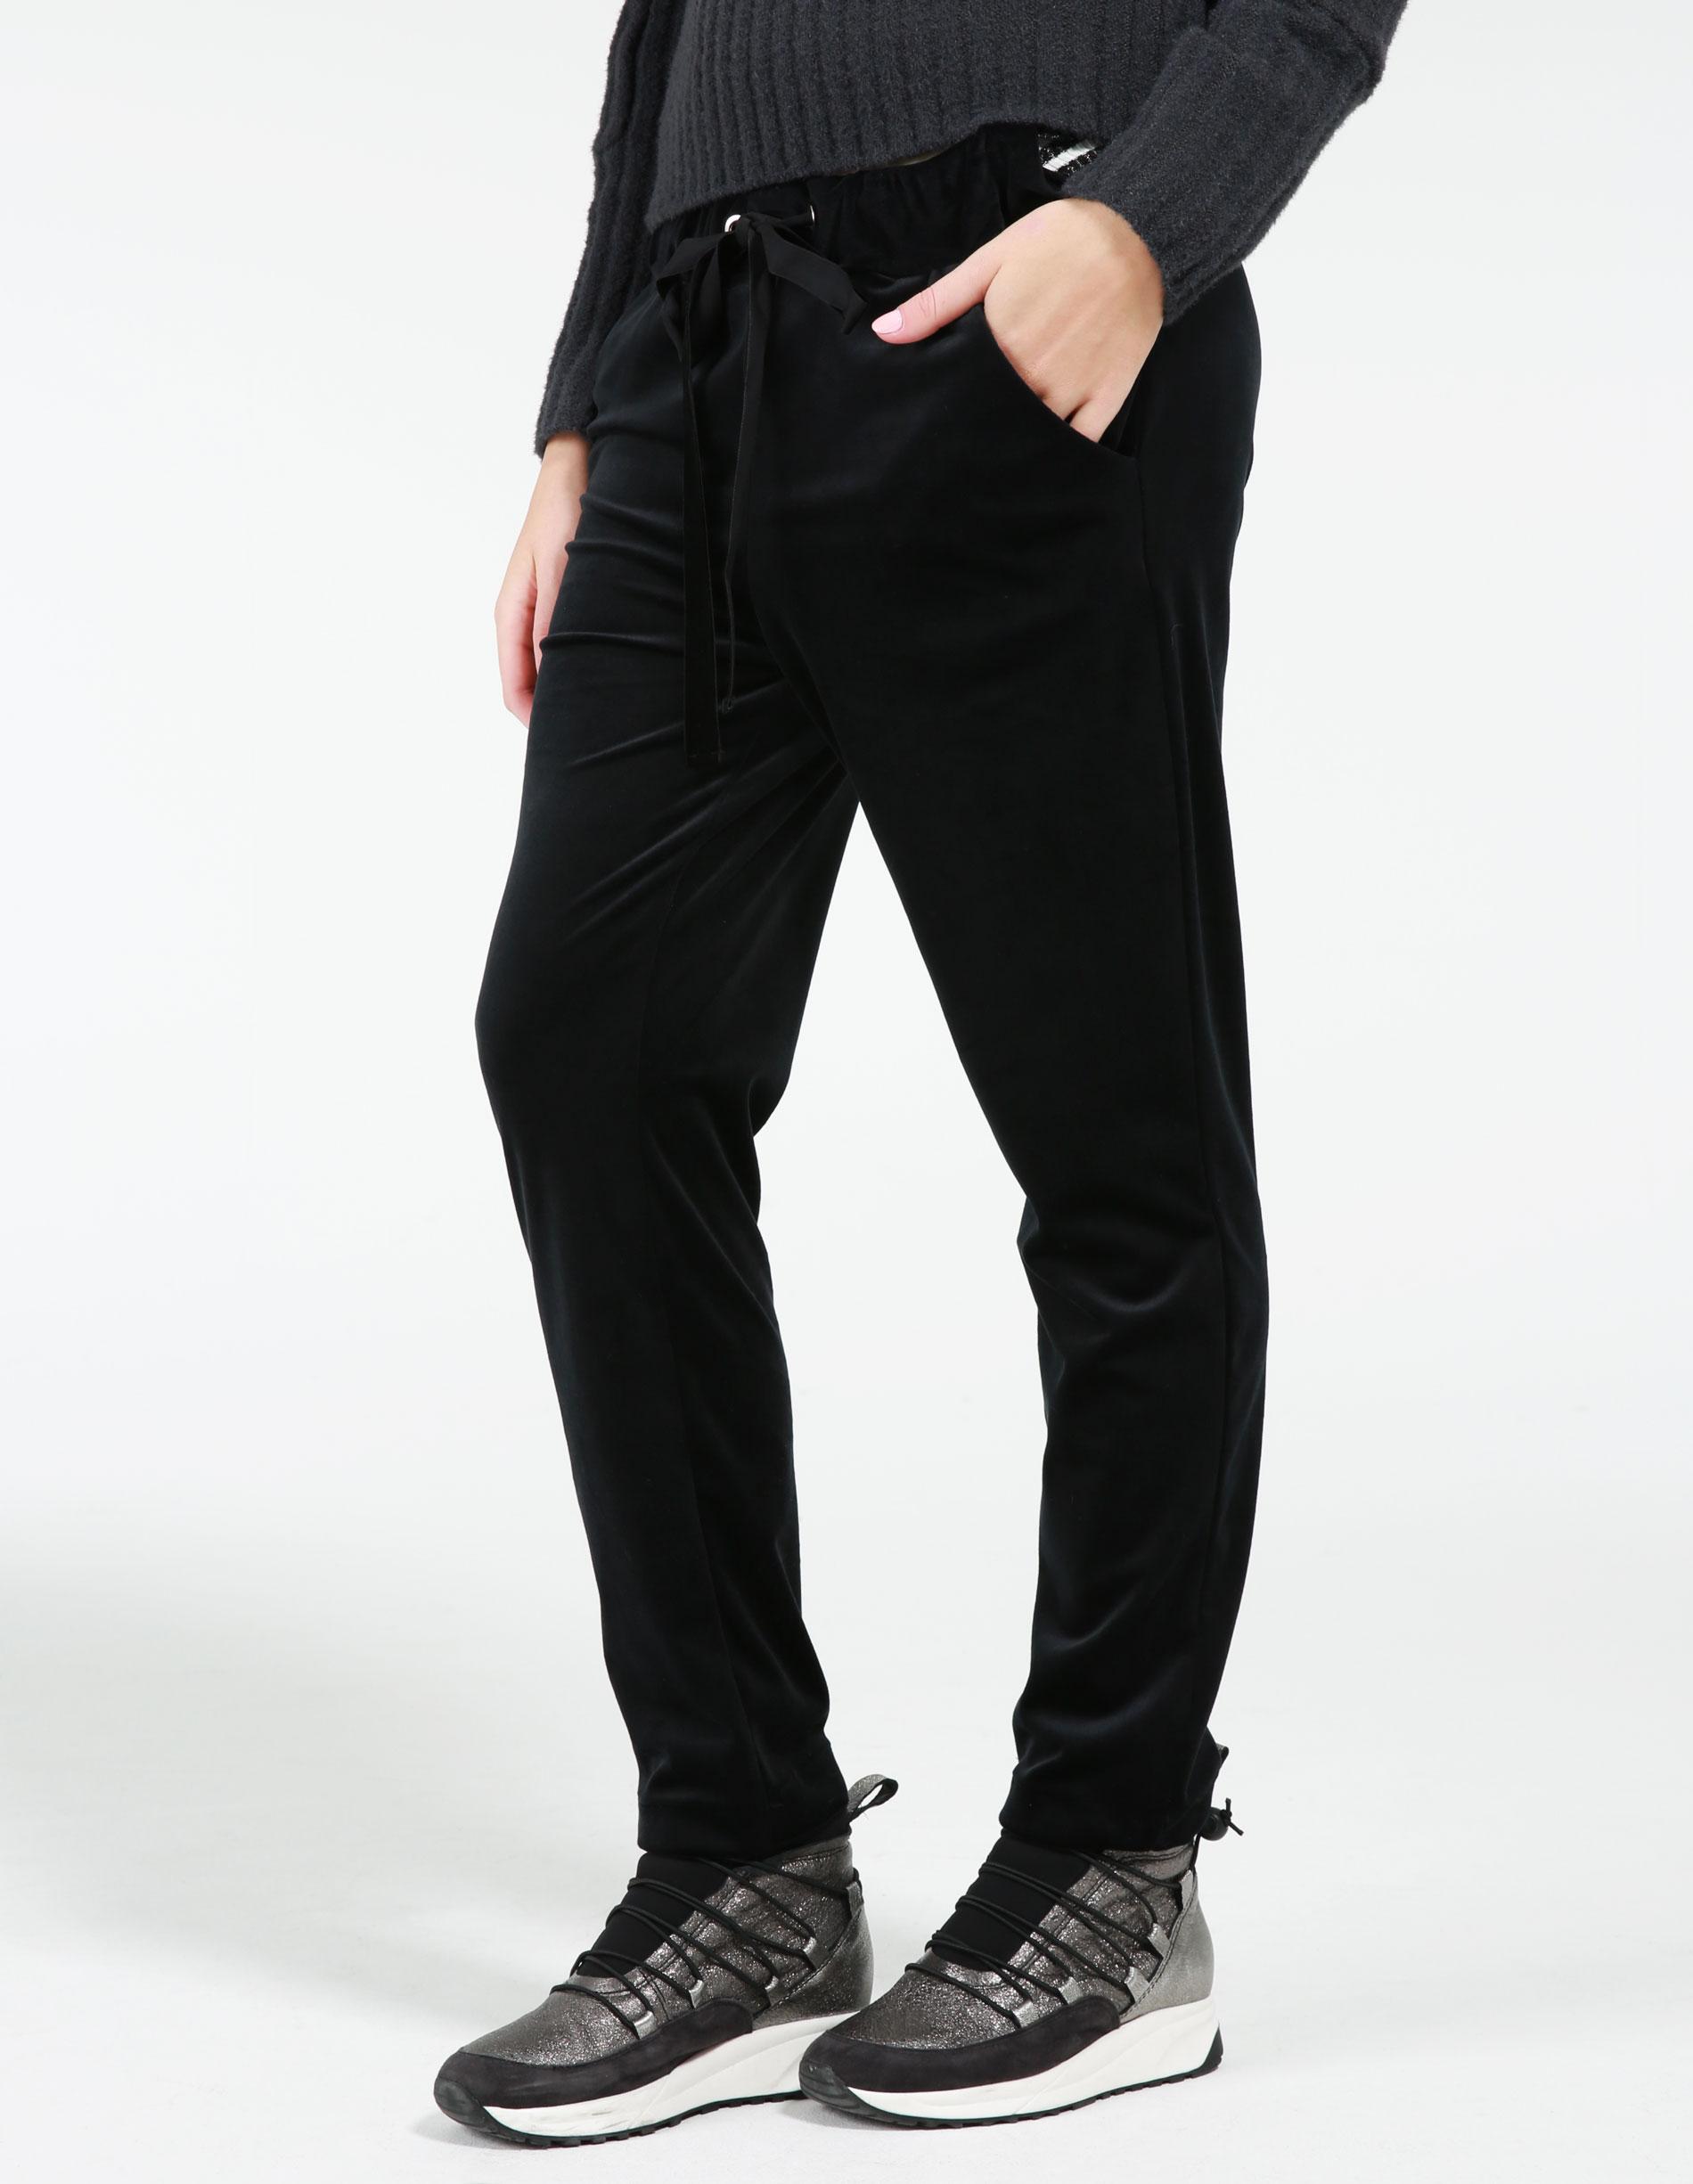 Spodnie - 3403 NERO - Unisono